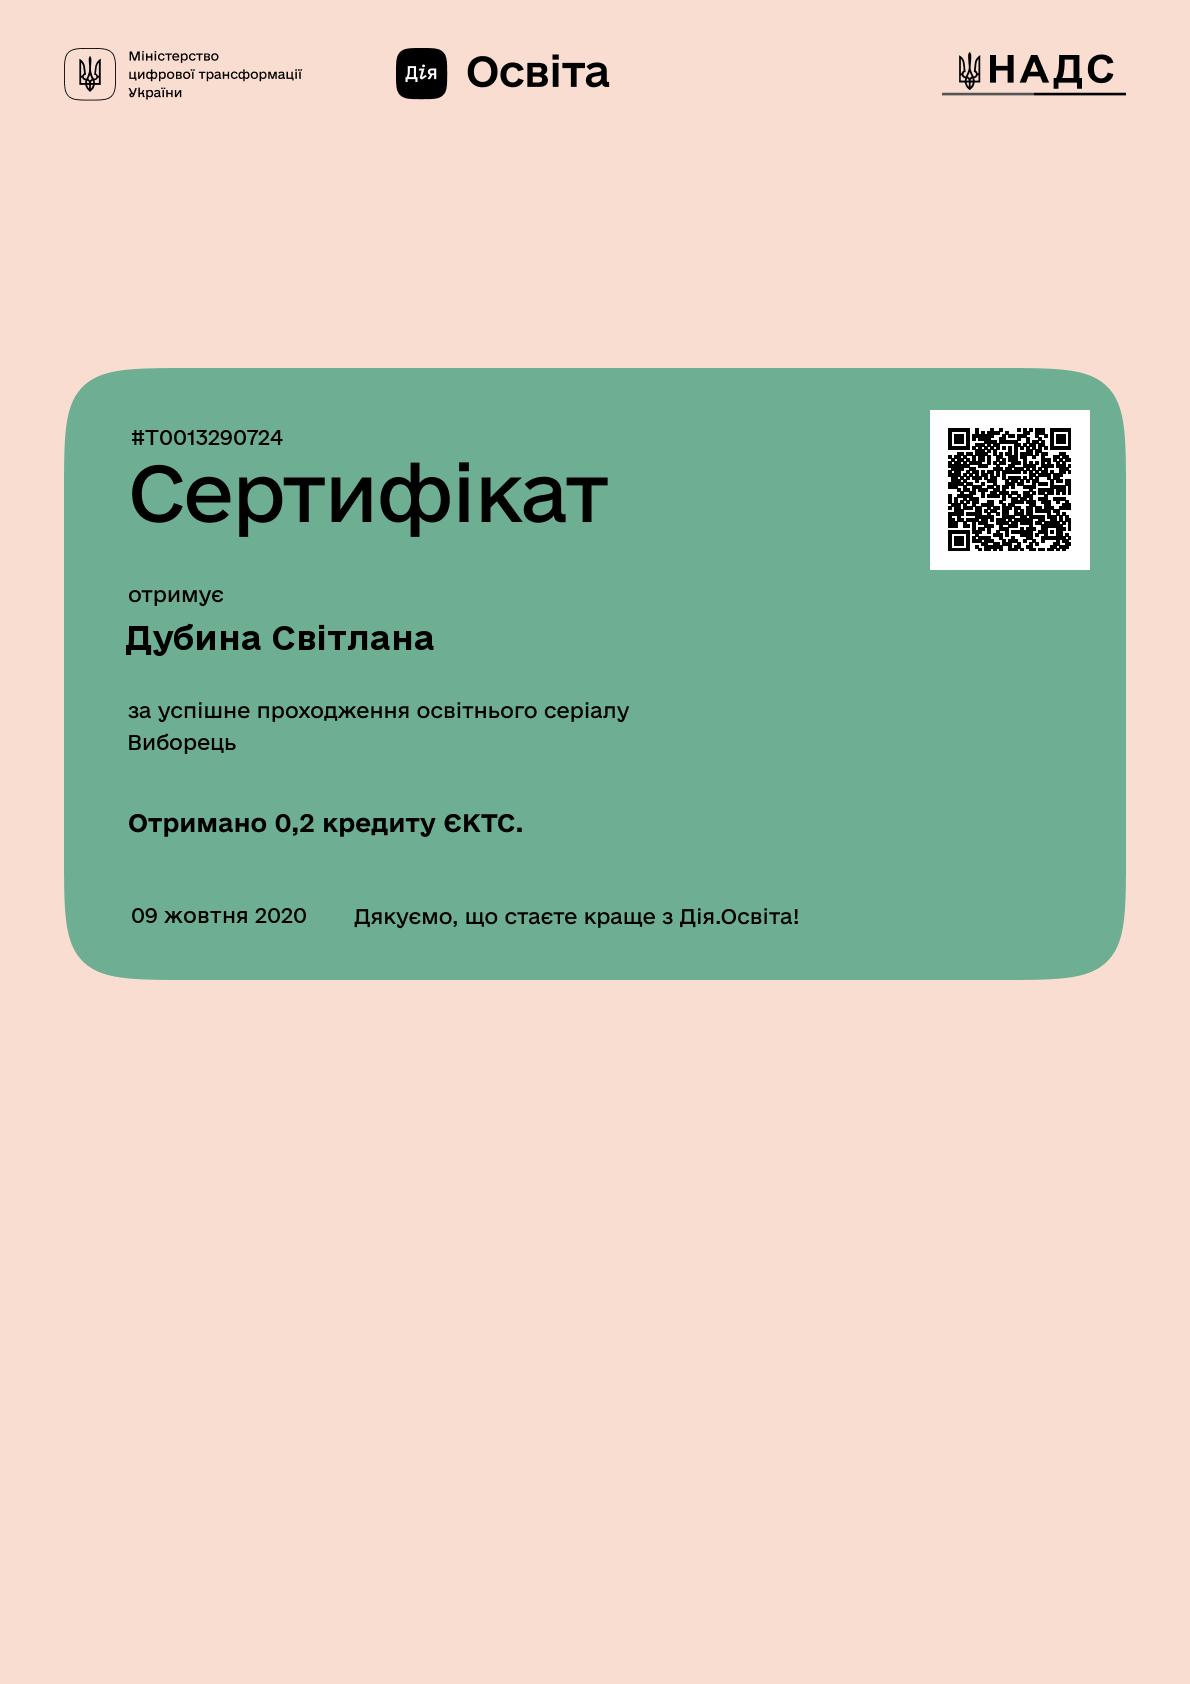 /uploads/certificate/20201009/HQMWxs7RXqxPe0rQZEUPnCwjSLMVu79r-1602228214.png